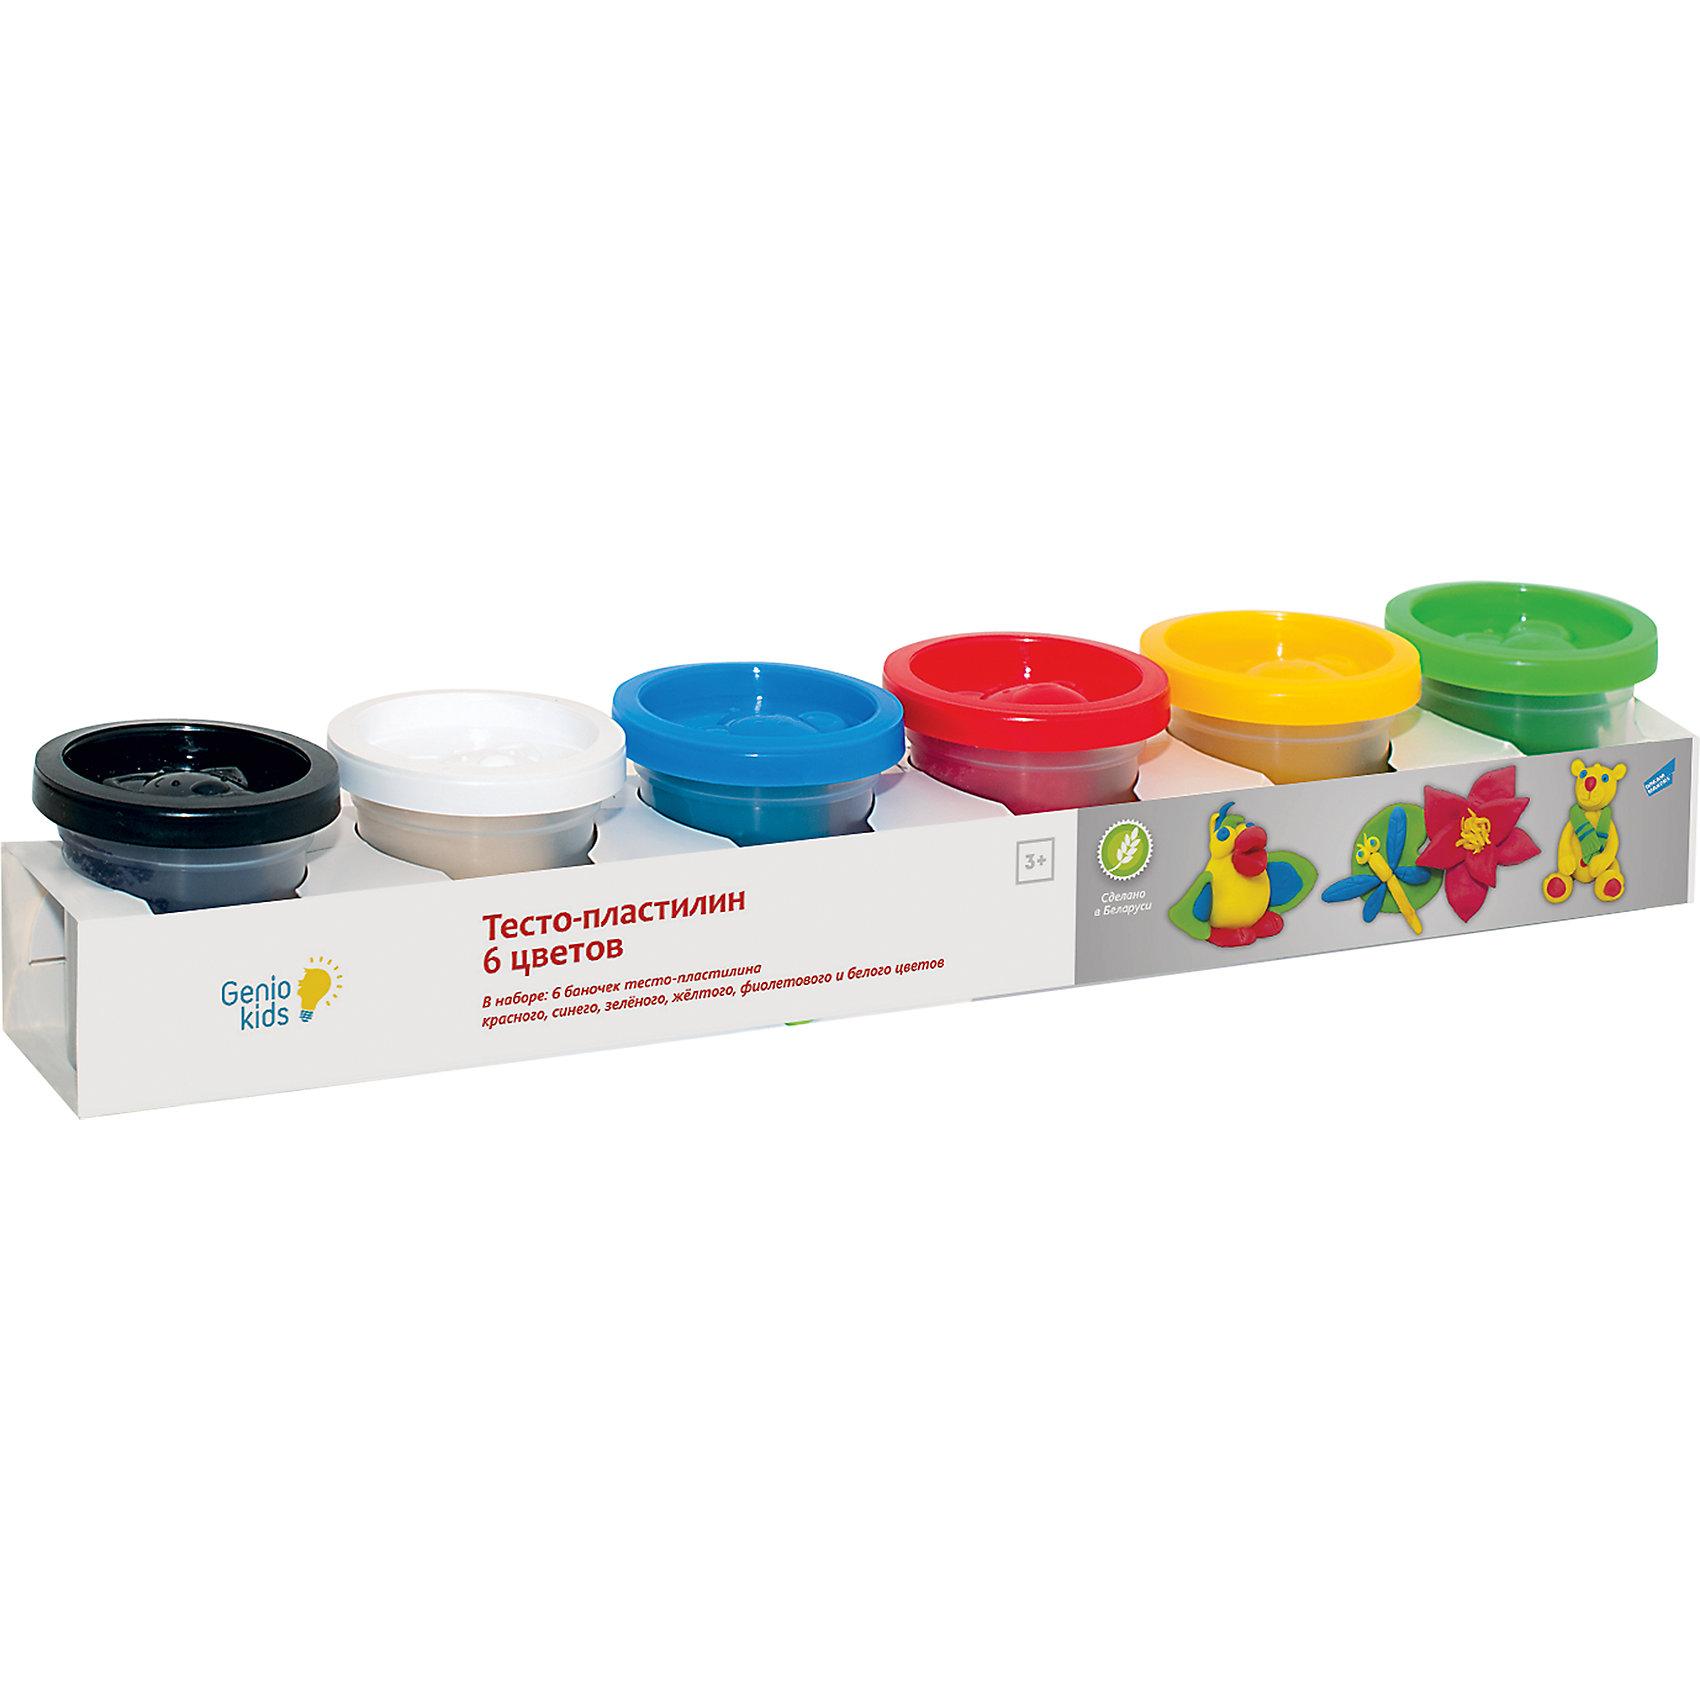 "Genio Kids Тесто-пластилин, 6 цветов genio kids набор для детского творчества ""шкатулка"""